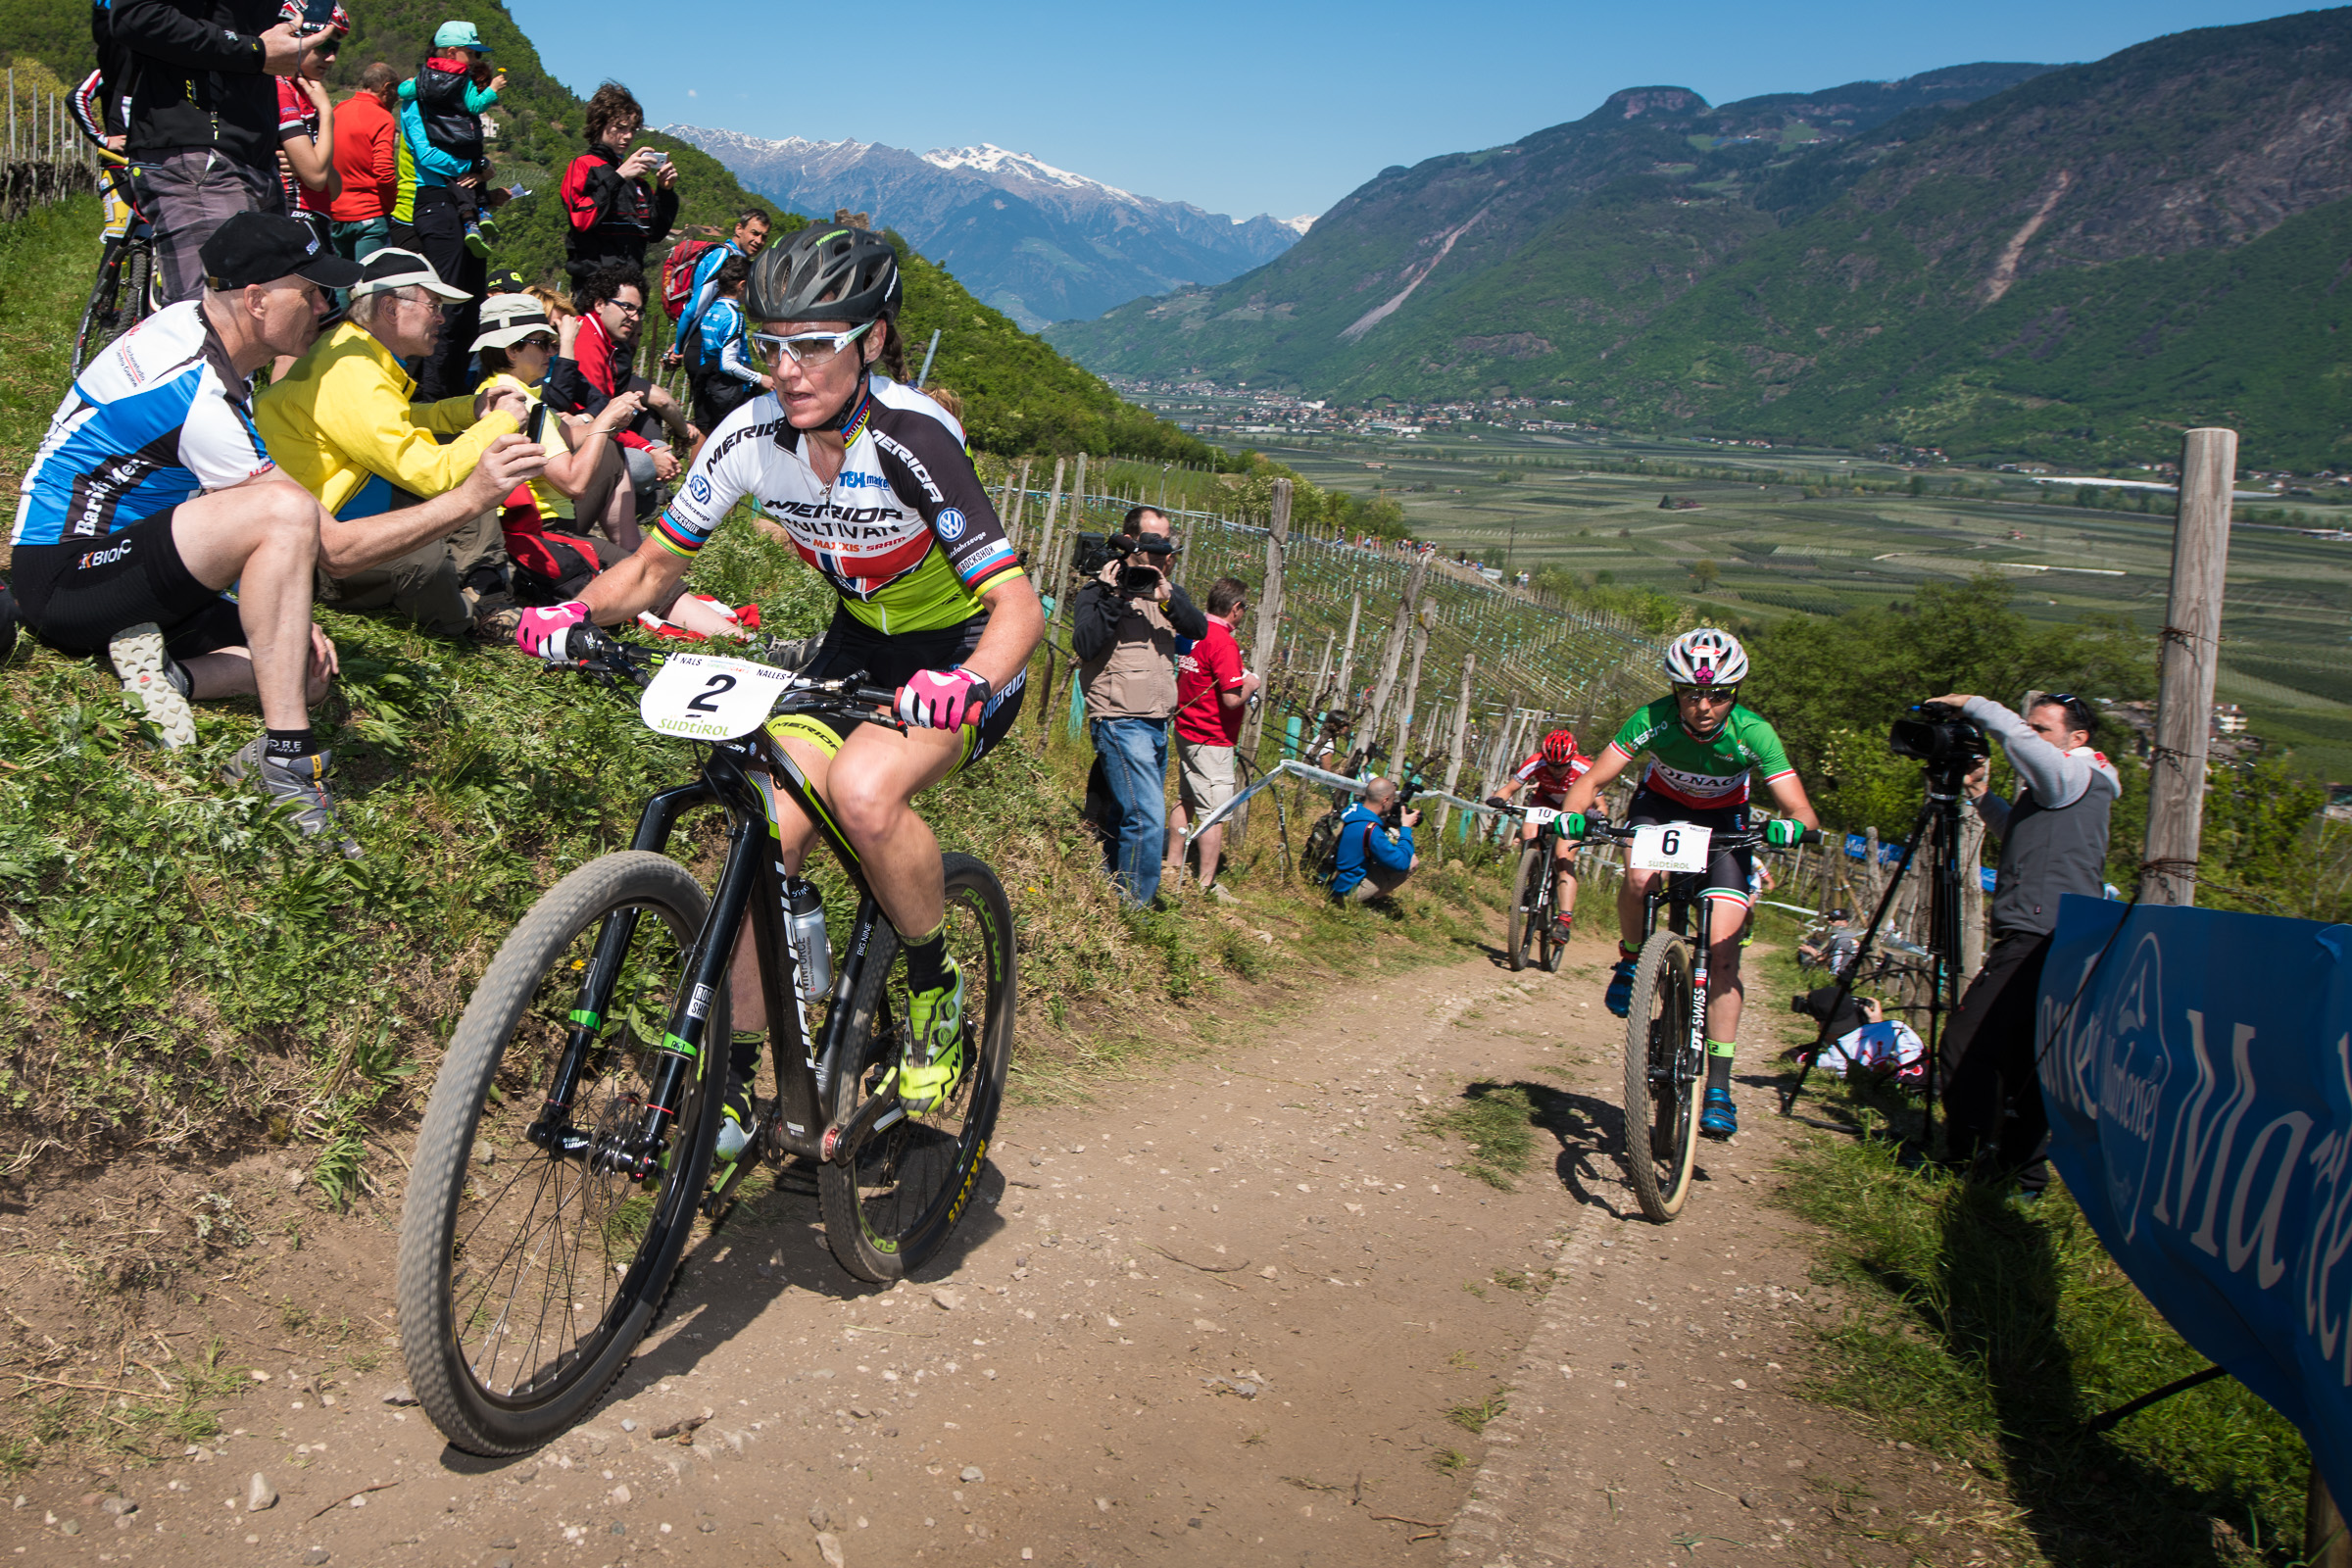 Gunn-Rita Dahle e Florian Vogel vincono la Marlene Südtirol Sunshine Race